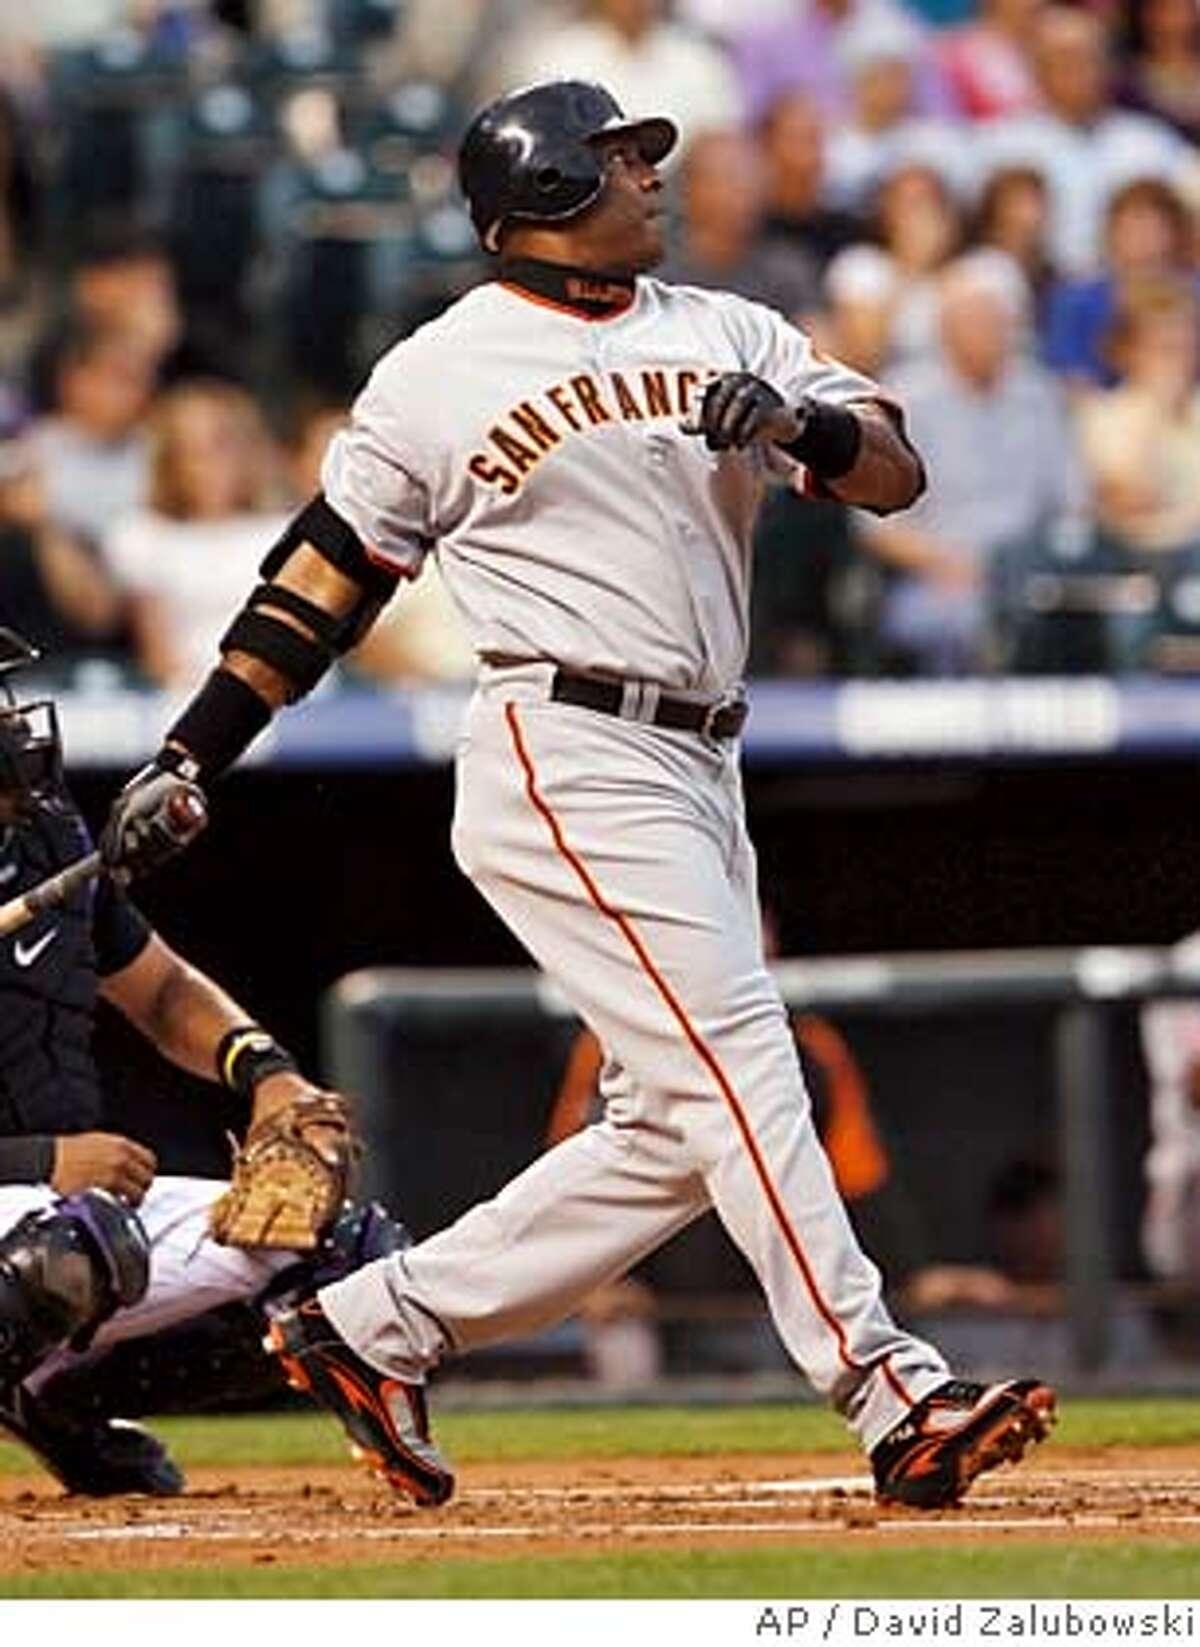 San Francisco Giants' Barry Bonds follows the flight of his two-run home run off Colorado Rockies starting pitcher Ubaldo Jimenez in the first inning of a baseball game in Denver on Wednesday, Sept. 5, 2007. (AP Photo/David Zalubowski)